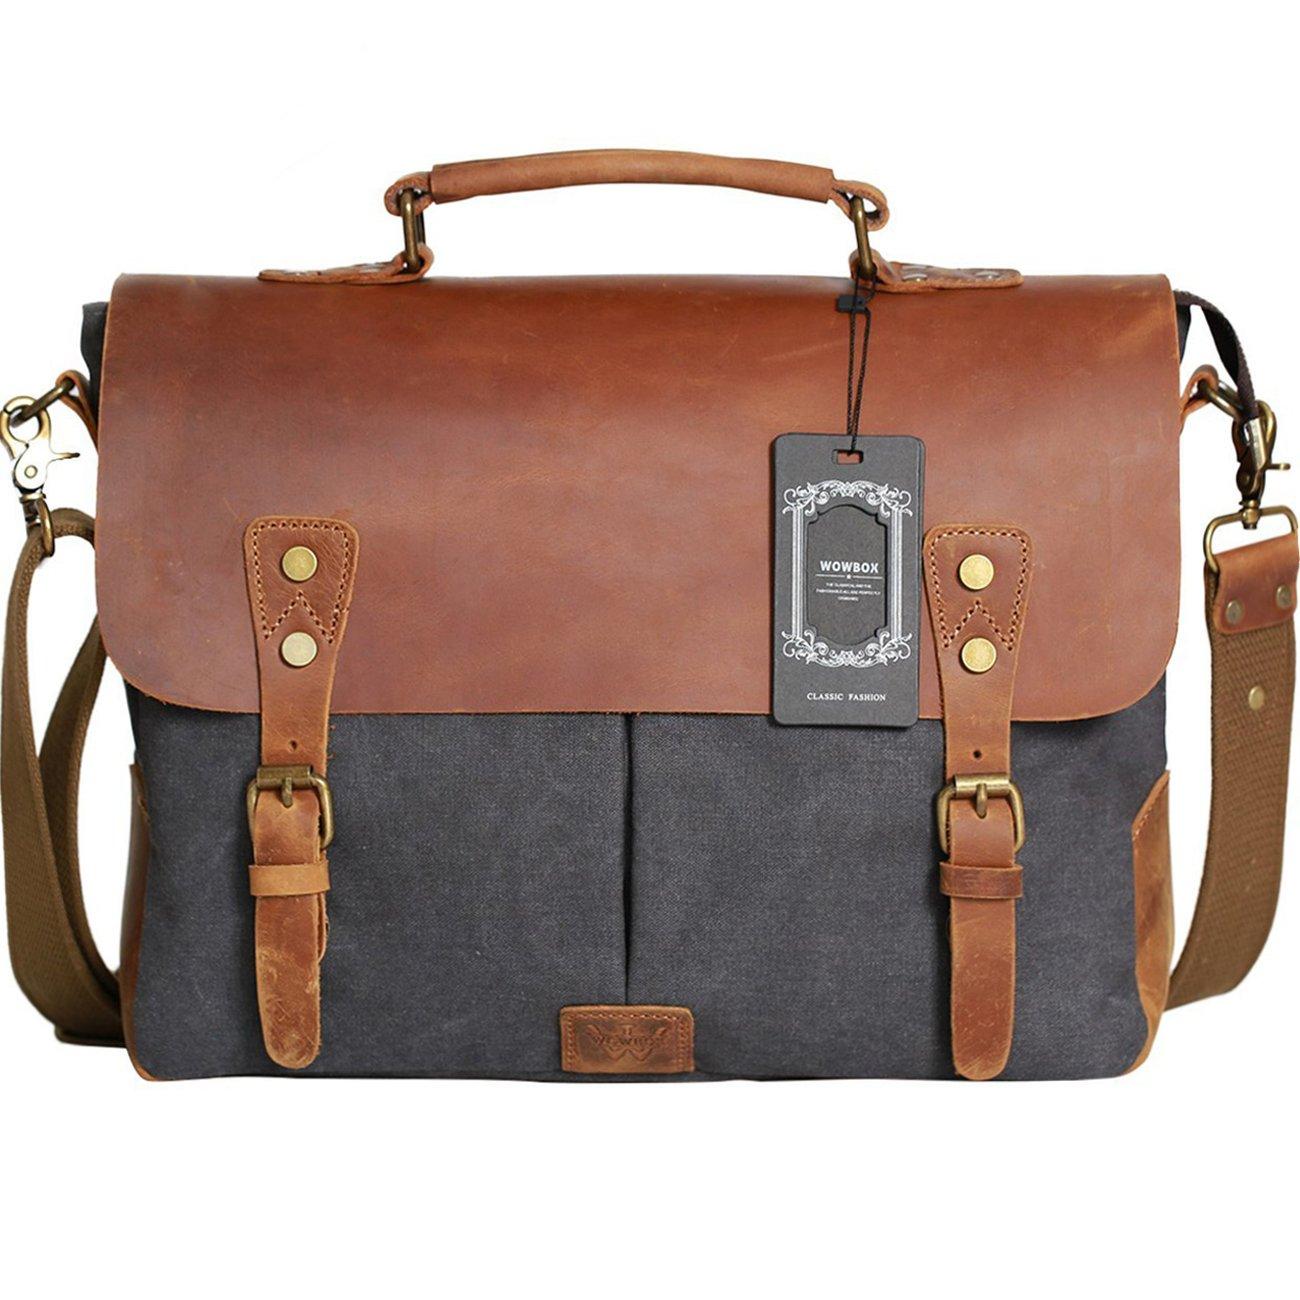 Amazon.com  Wowbox Messenger Satchel Bag for Men and Women 54988c812581e